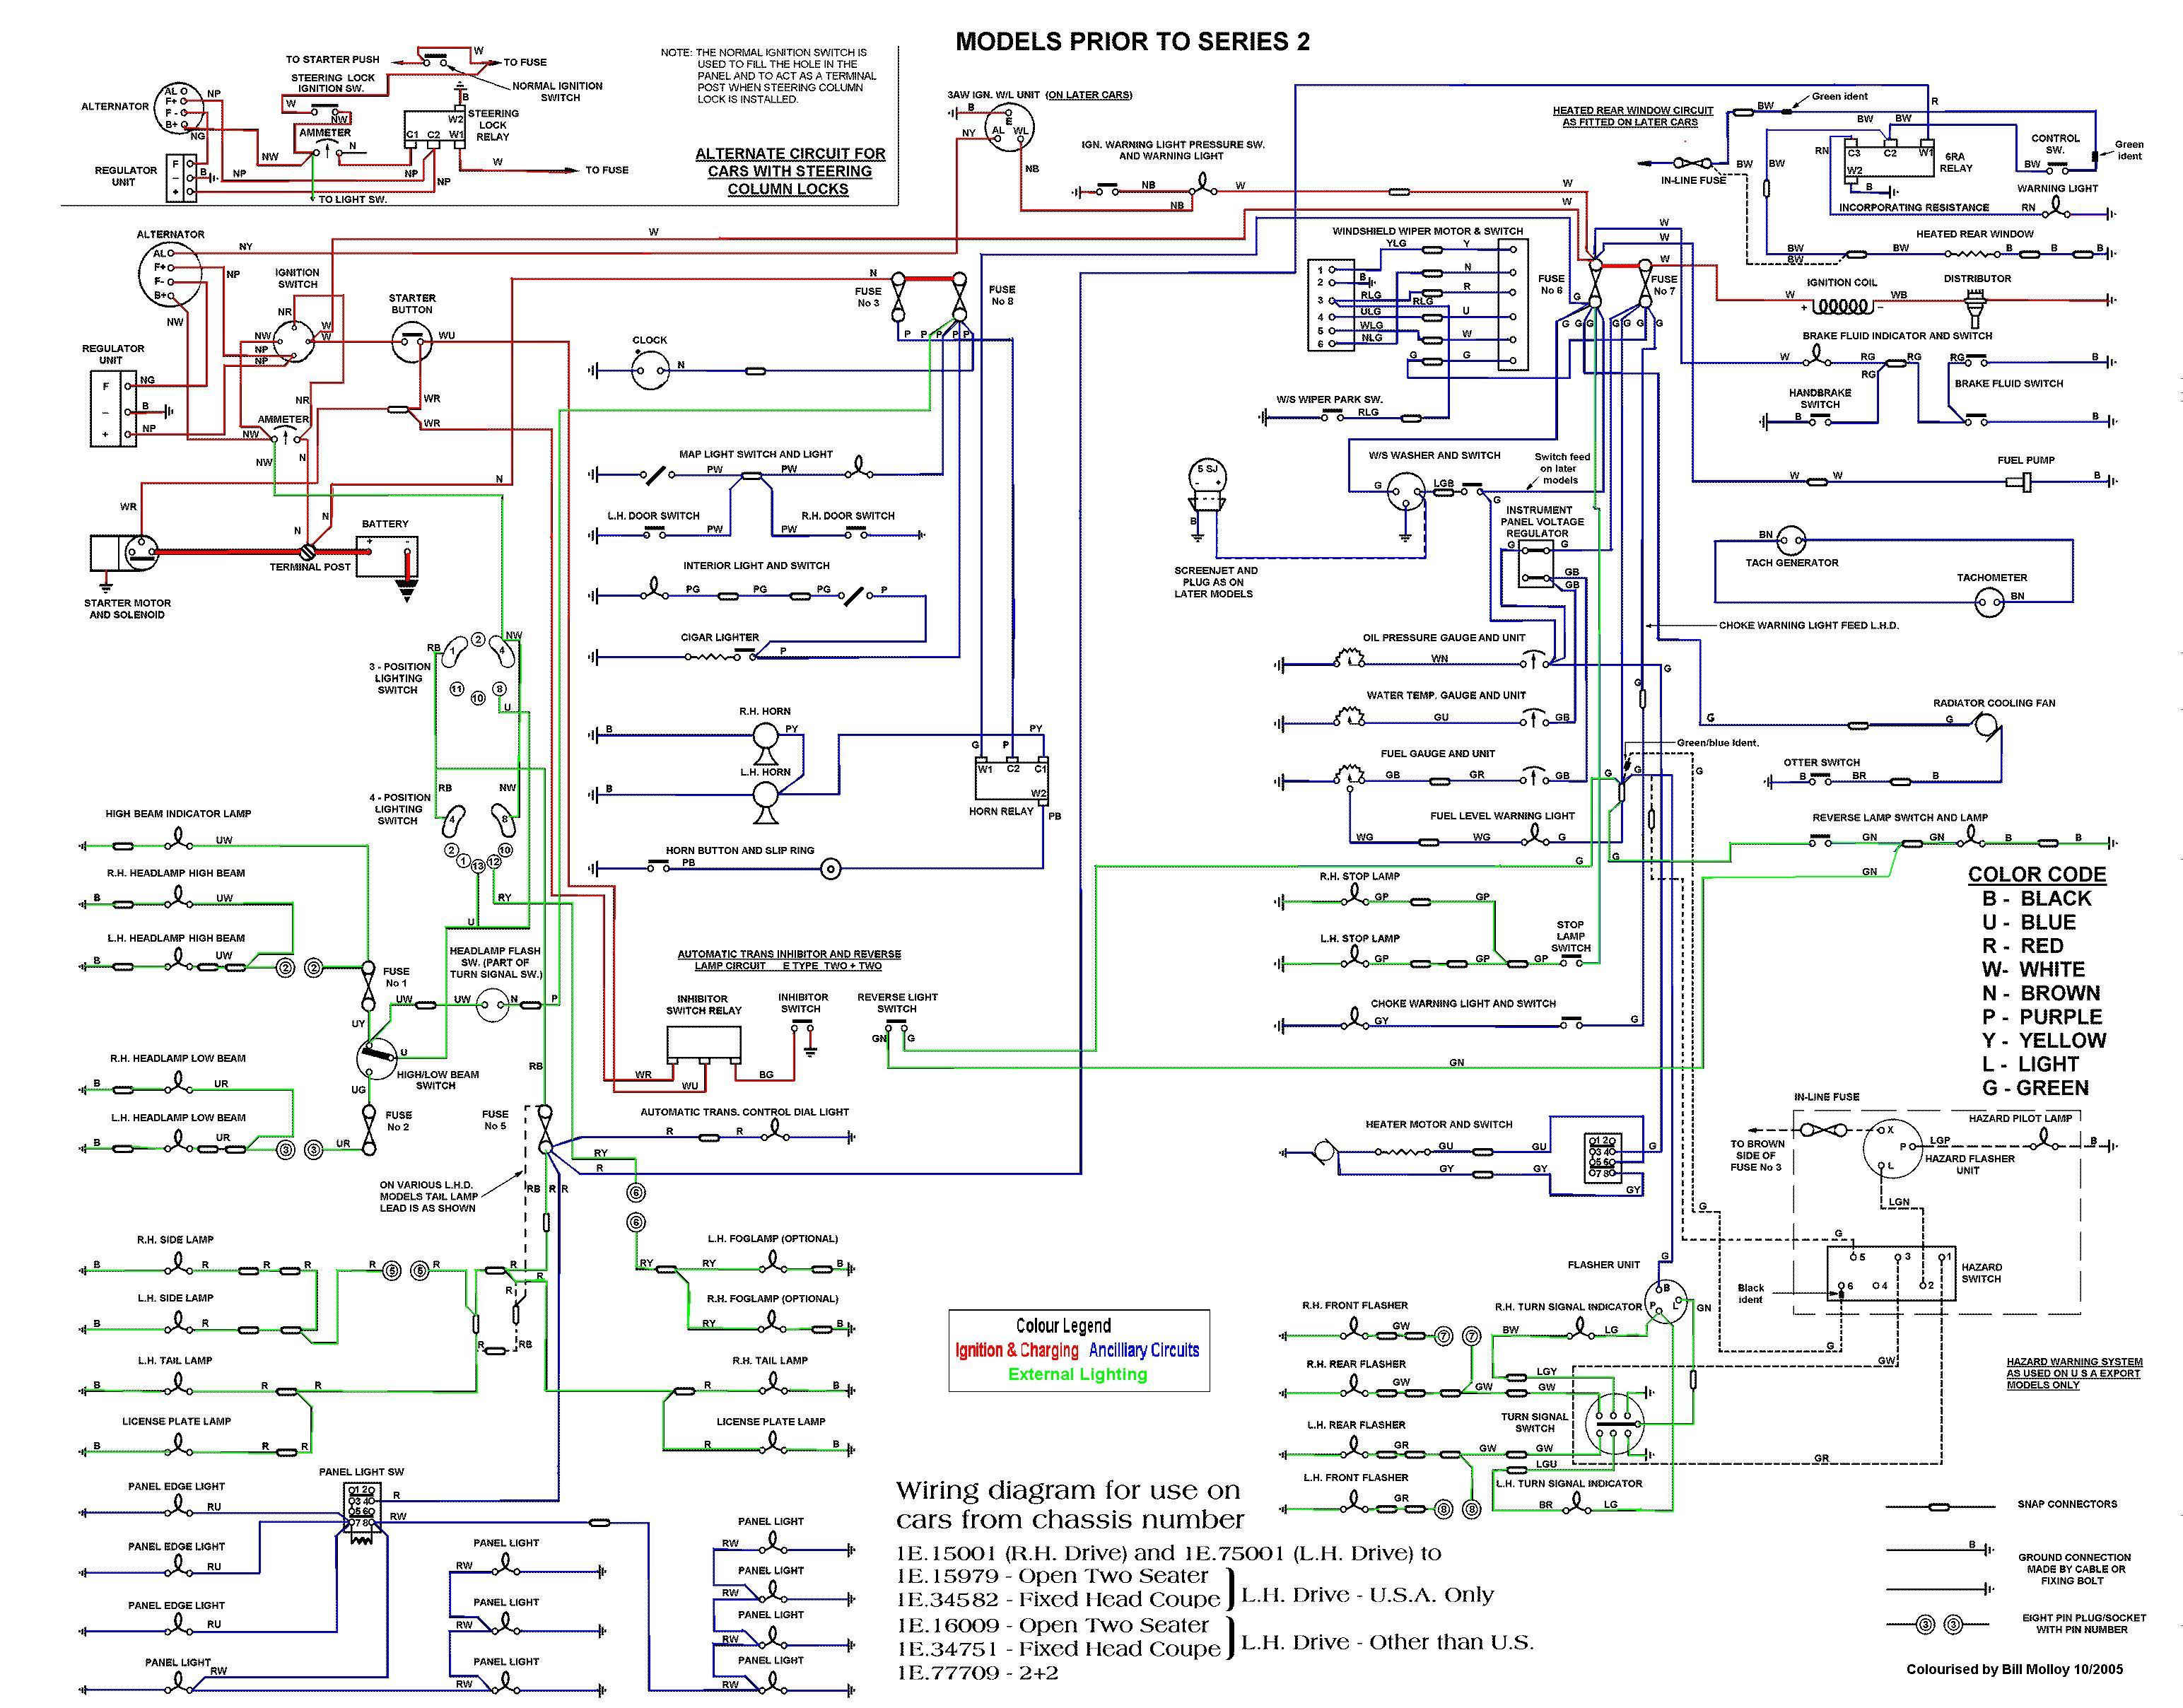 Usb Wiring Diagram Pdf Libraries Front Jaguar Xjs Abs Simple Diagramsjaguar Third Level